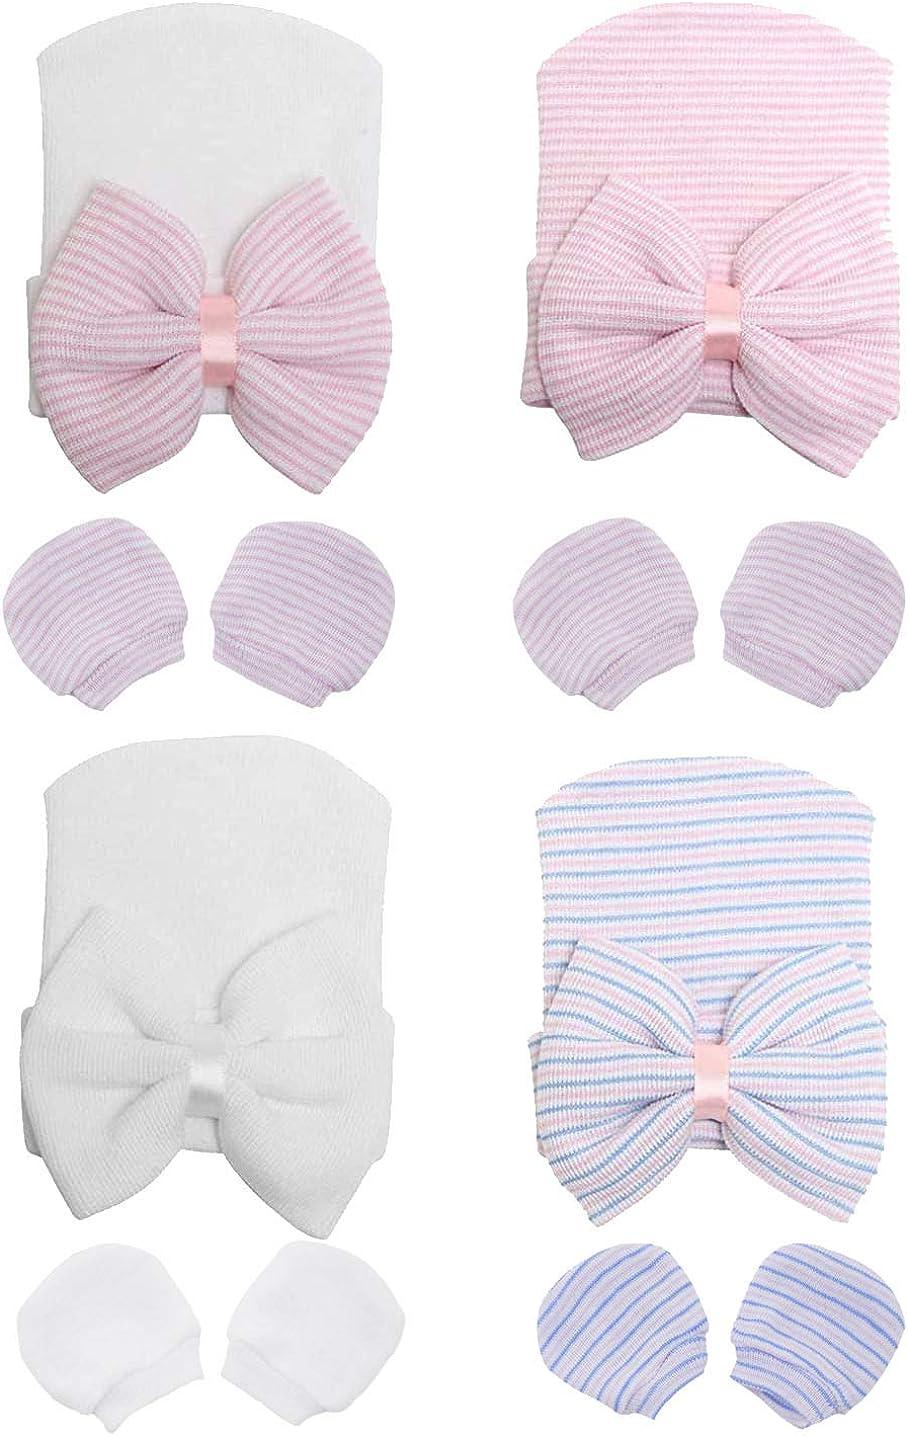 Gellwhu Newborn Girl Beanies Hats Baby Scratch Mittens Gloves Infant Nursery Large Big Bow Hospital Caps (4 Beanie Hats & 4 Pairs Mittens Gloves)